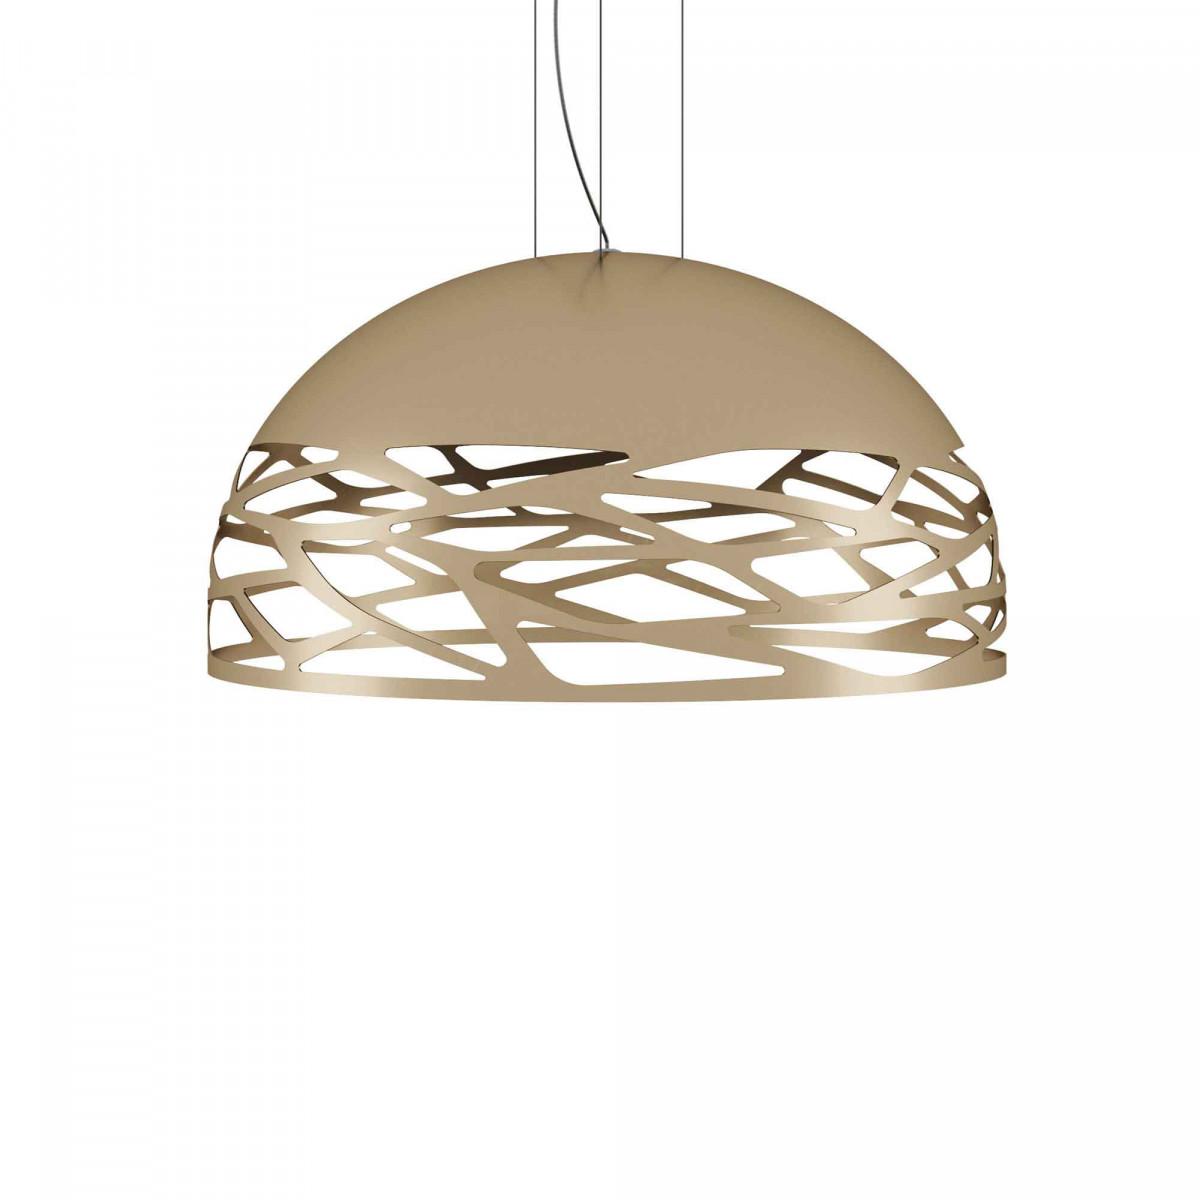 Kelly Medium Dome Ø60 pendellampe i Italiensk design